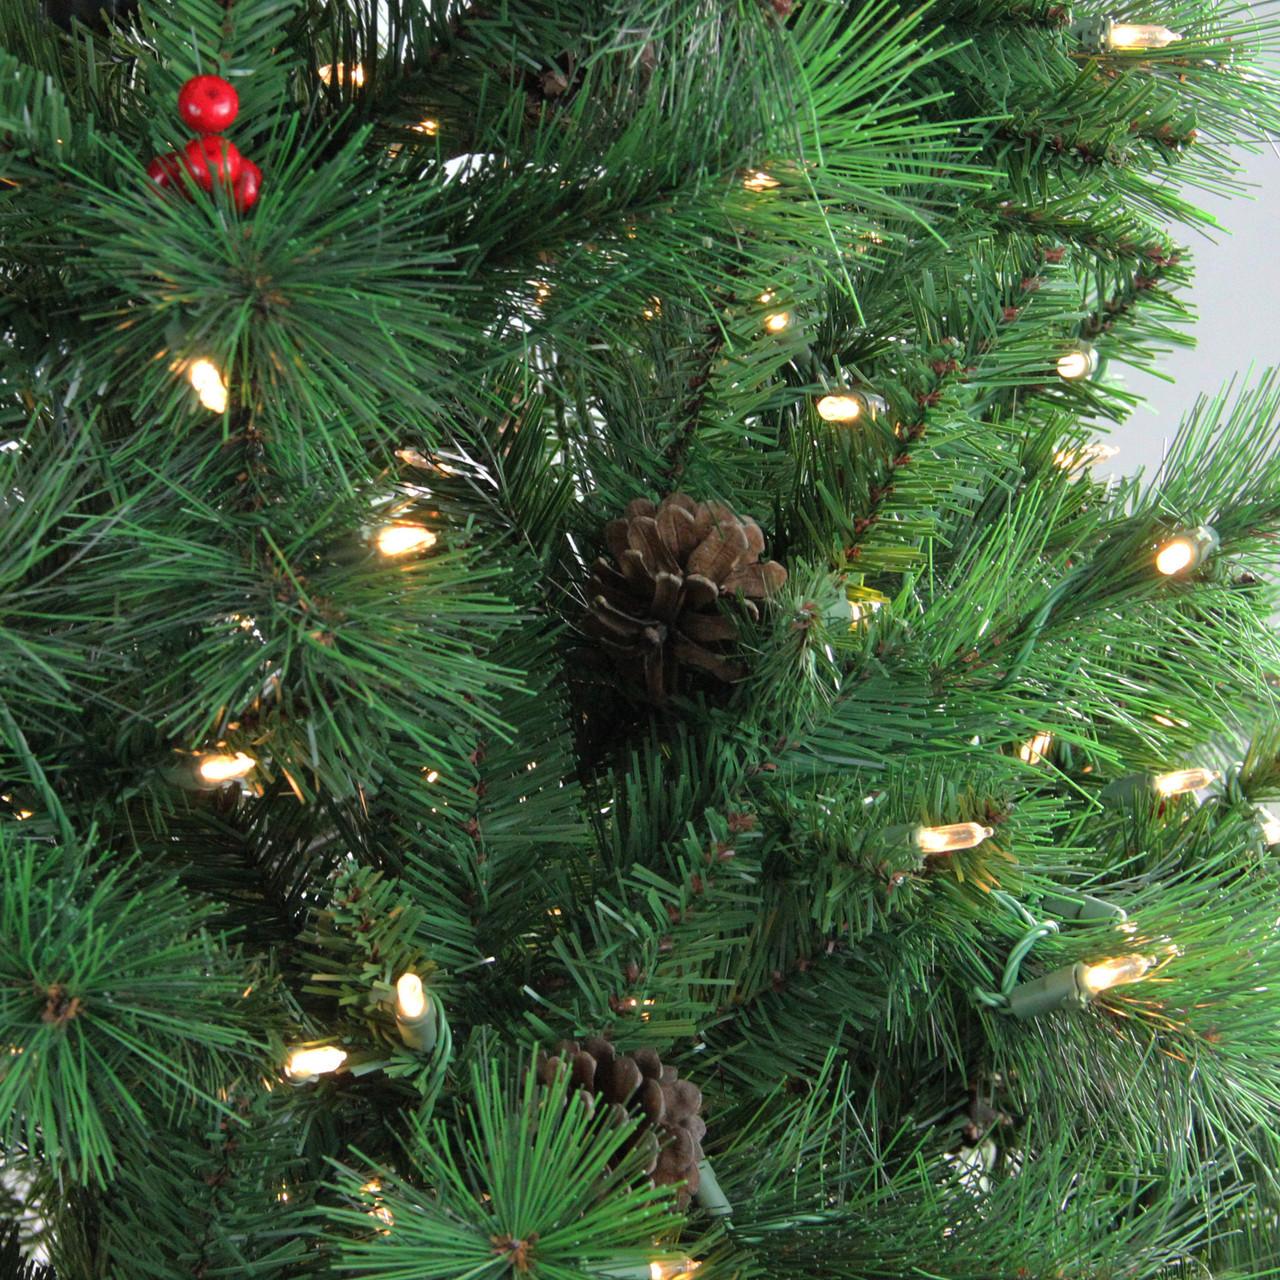 22aefd08c4e 6.5  Pre-Lit Denali Mixed Pine Artificial Christmas Tree - Dual LED ...